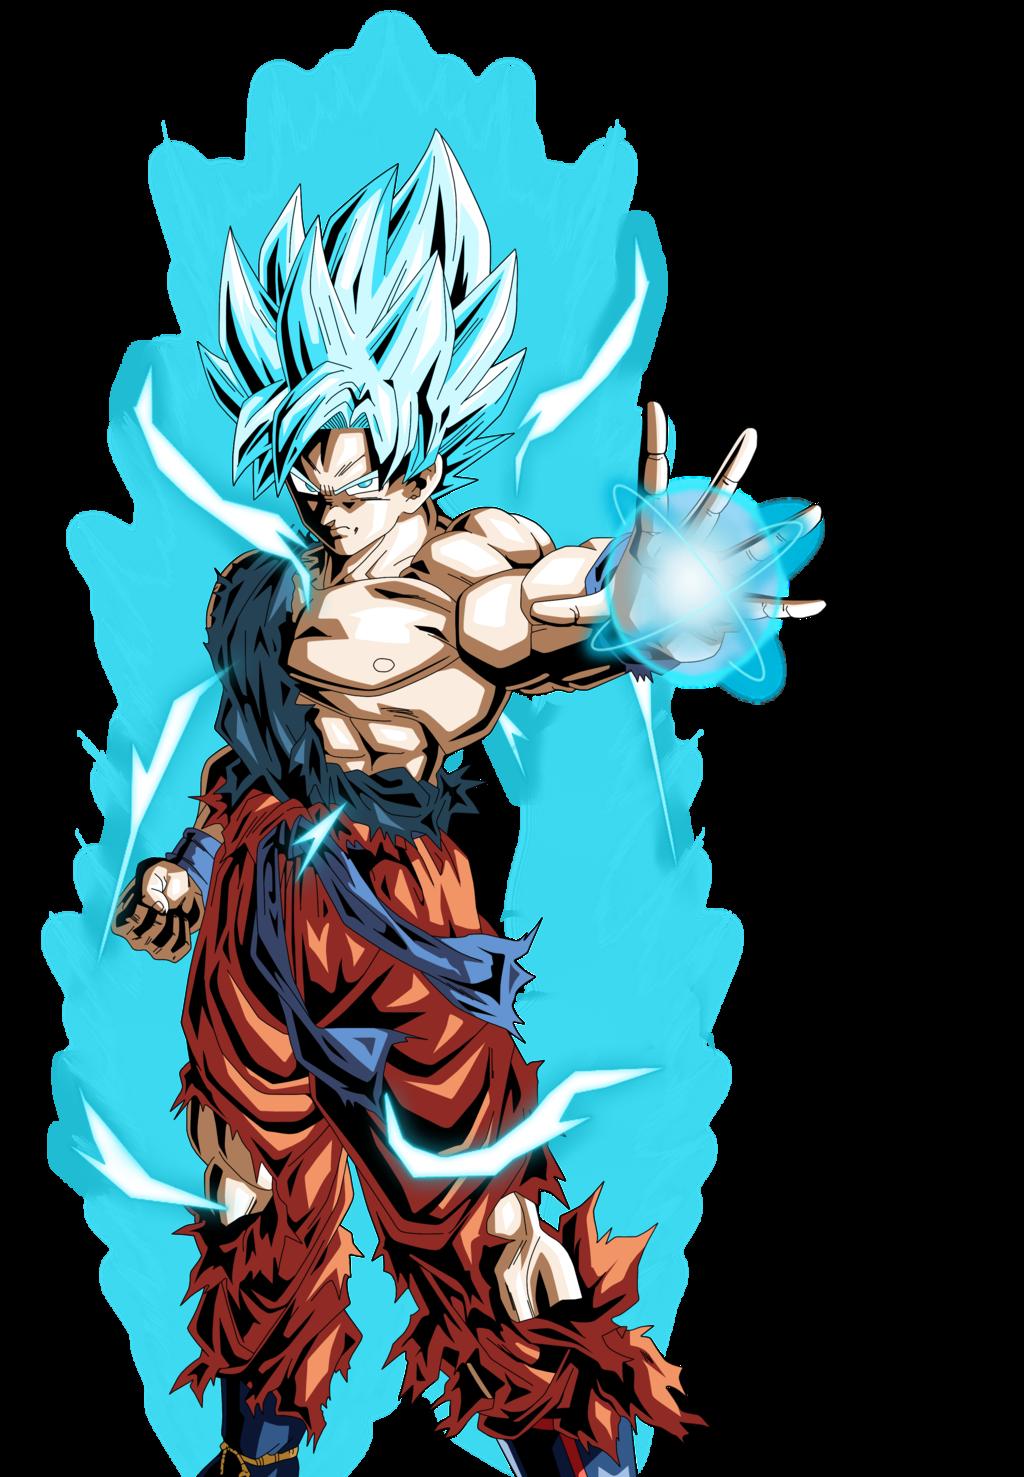 Goku ssj god wallpaper wallpapersafari - San goku super saiyan 5 ...